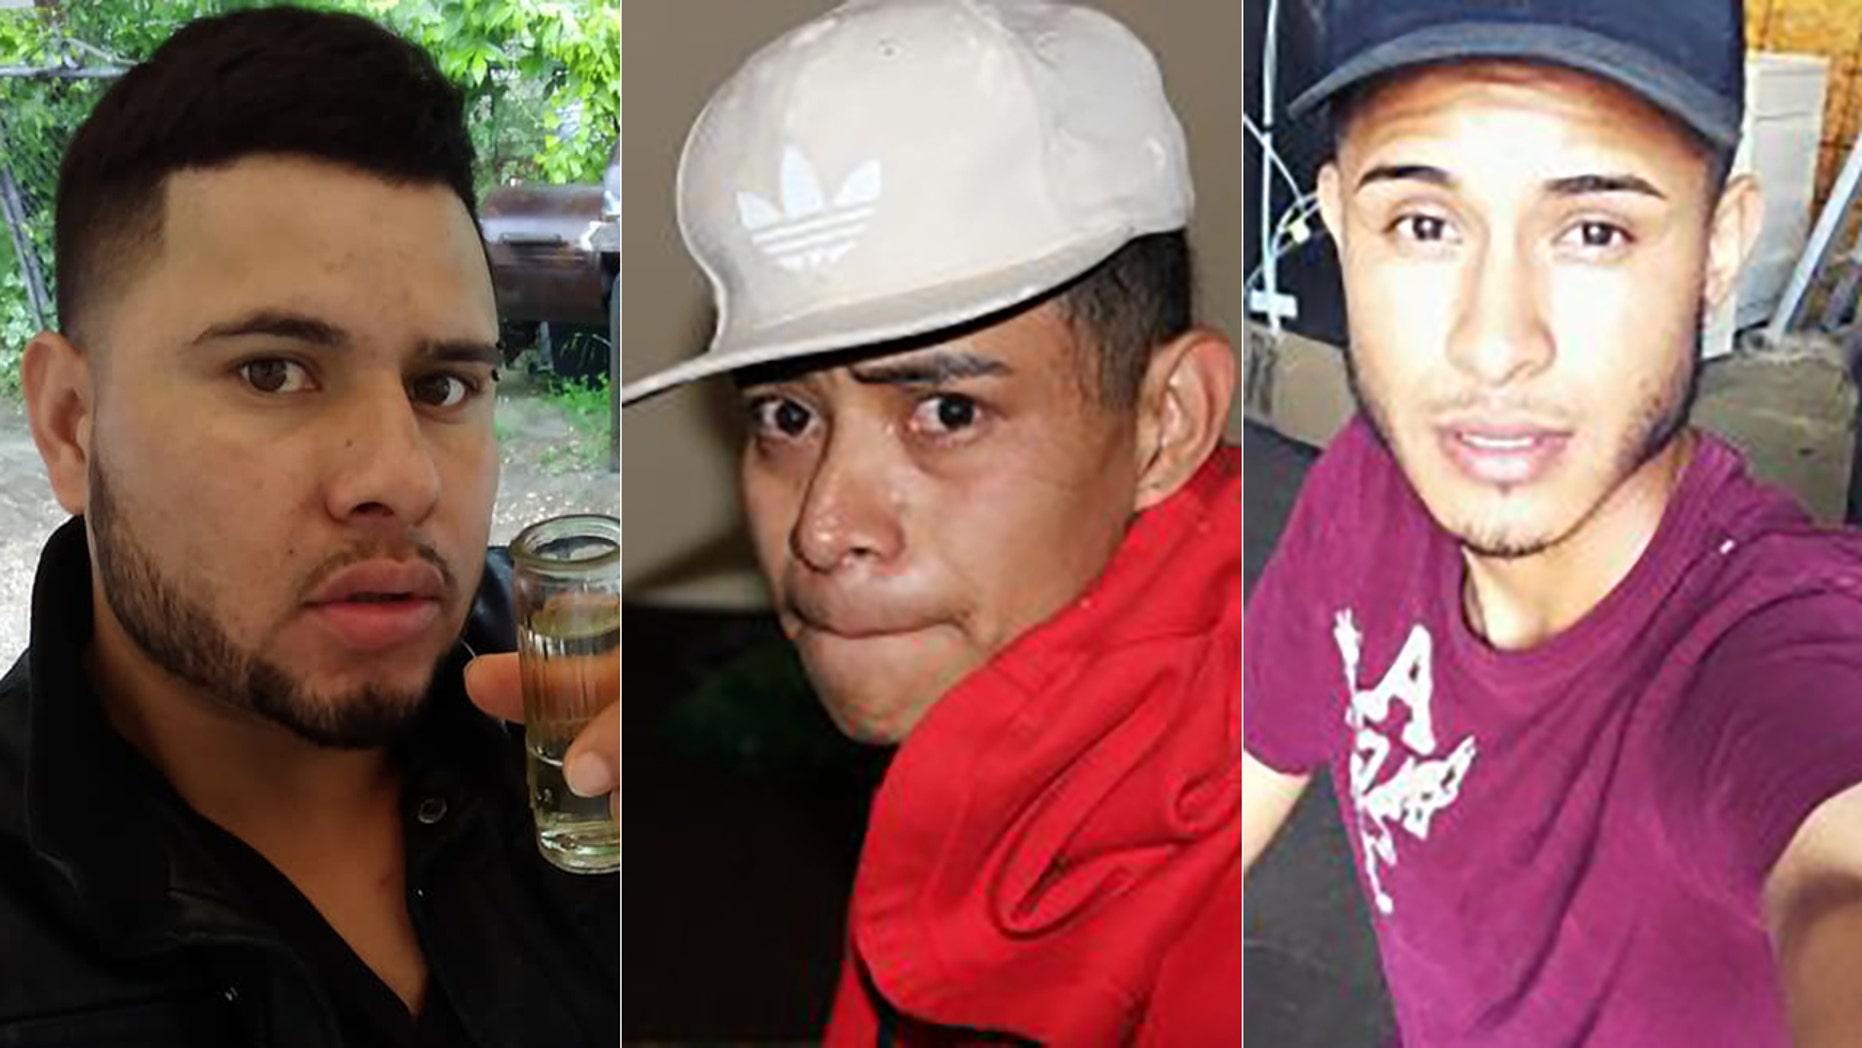 David Ramos Contreras, Rios Adiel and Arnuflo Ramos.